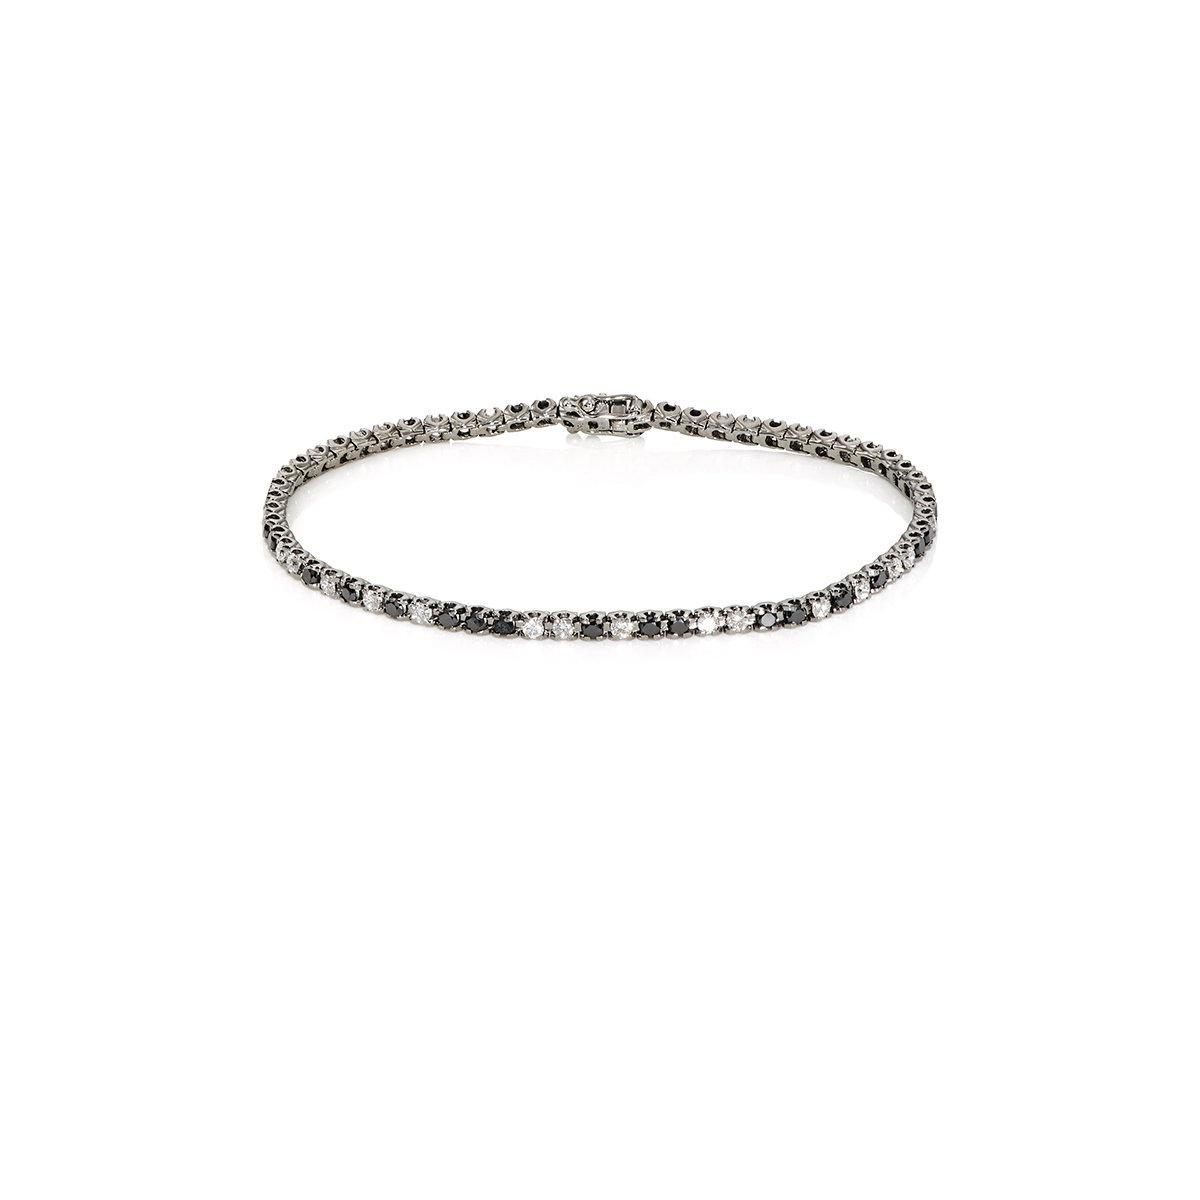 Ombre Staple Bracelet Eva Fehren BJPEImh